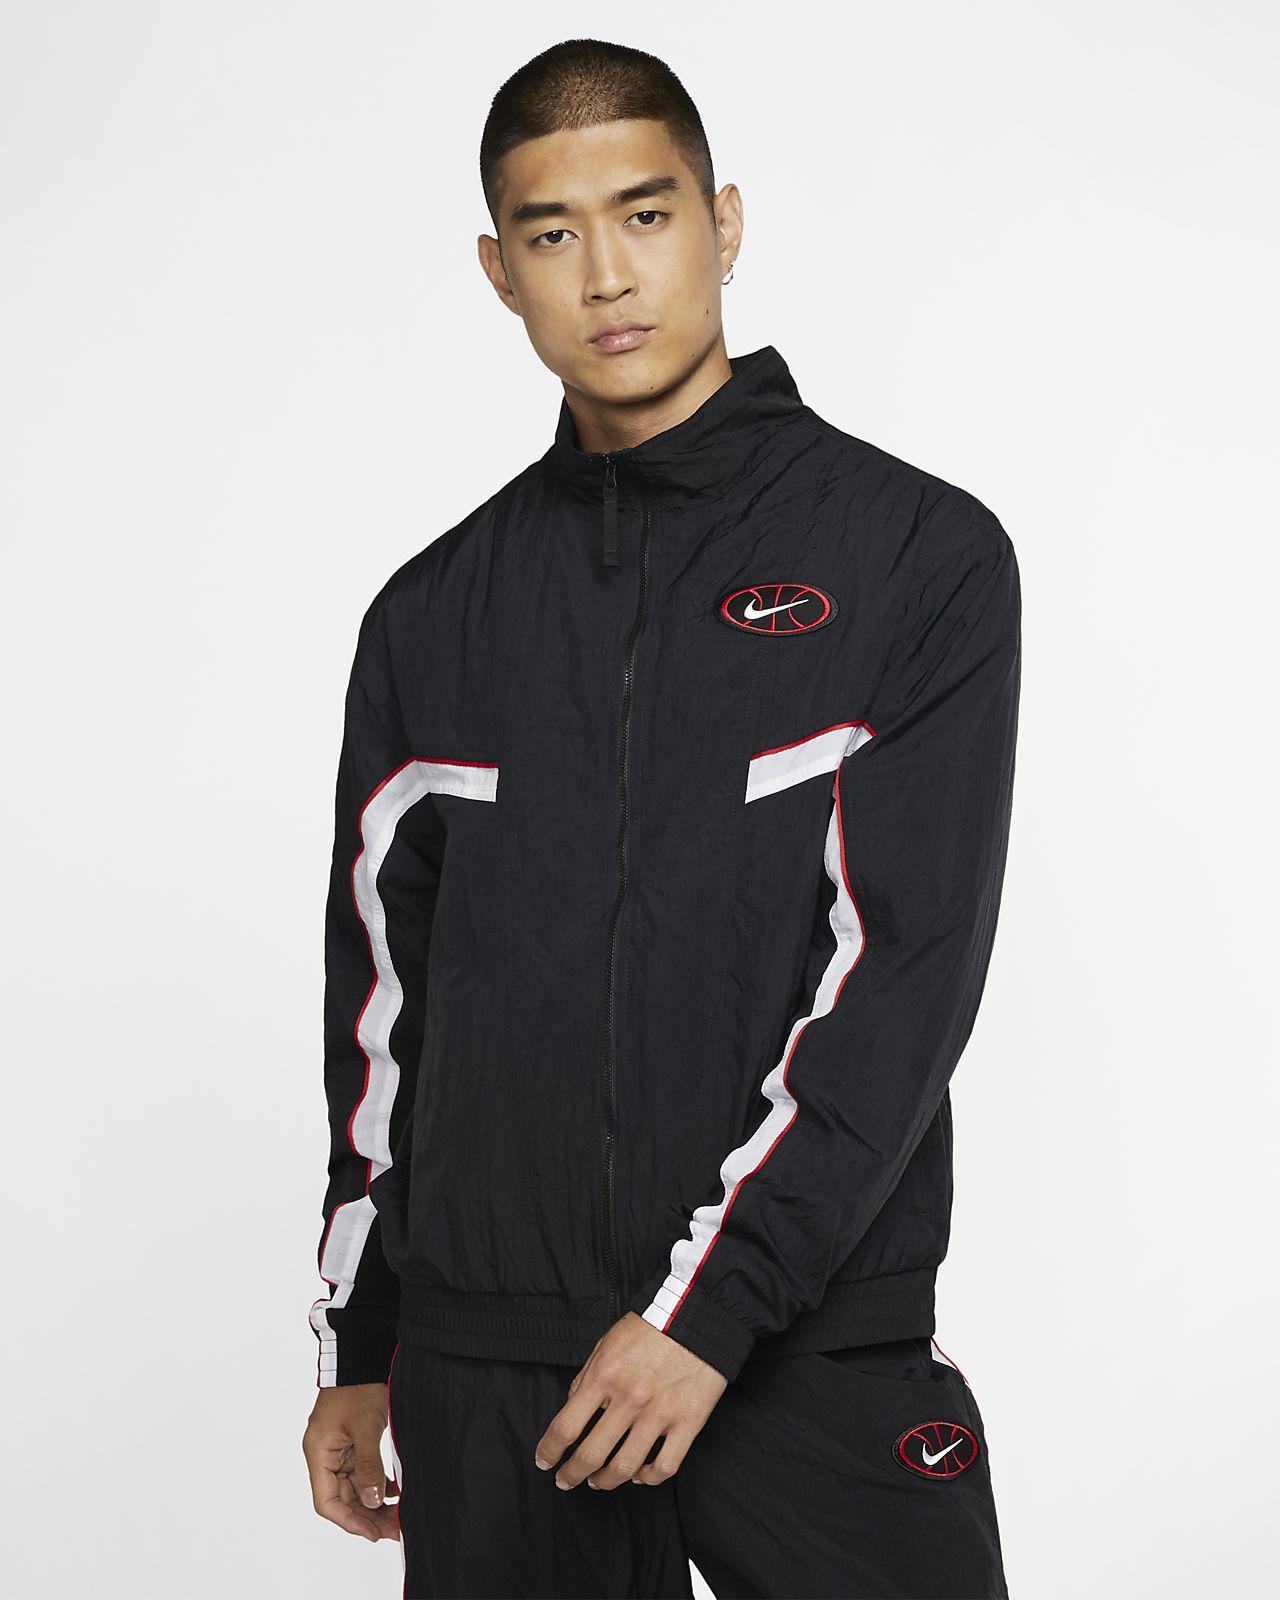 Nike Throwback Men's Woven Basketball Jacket